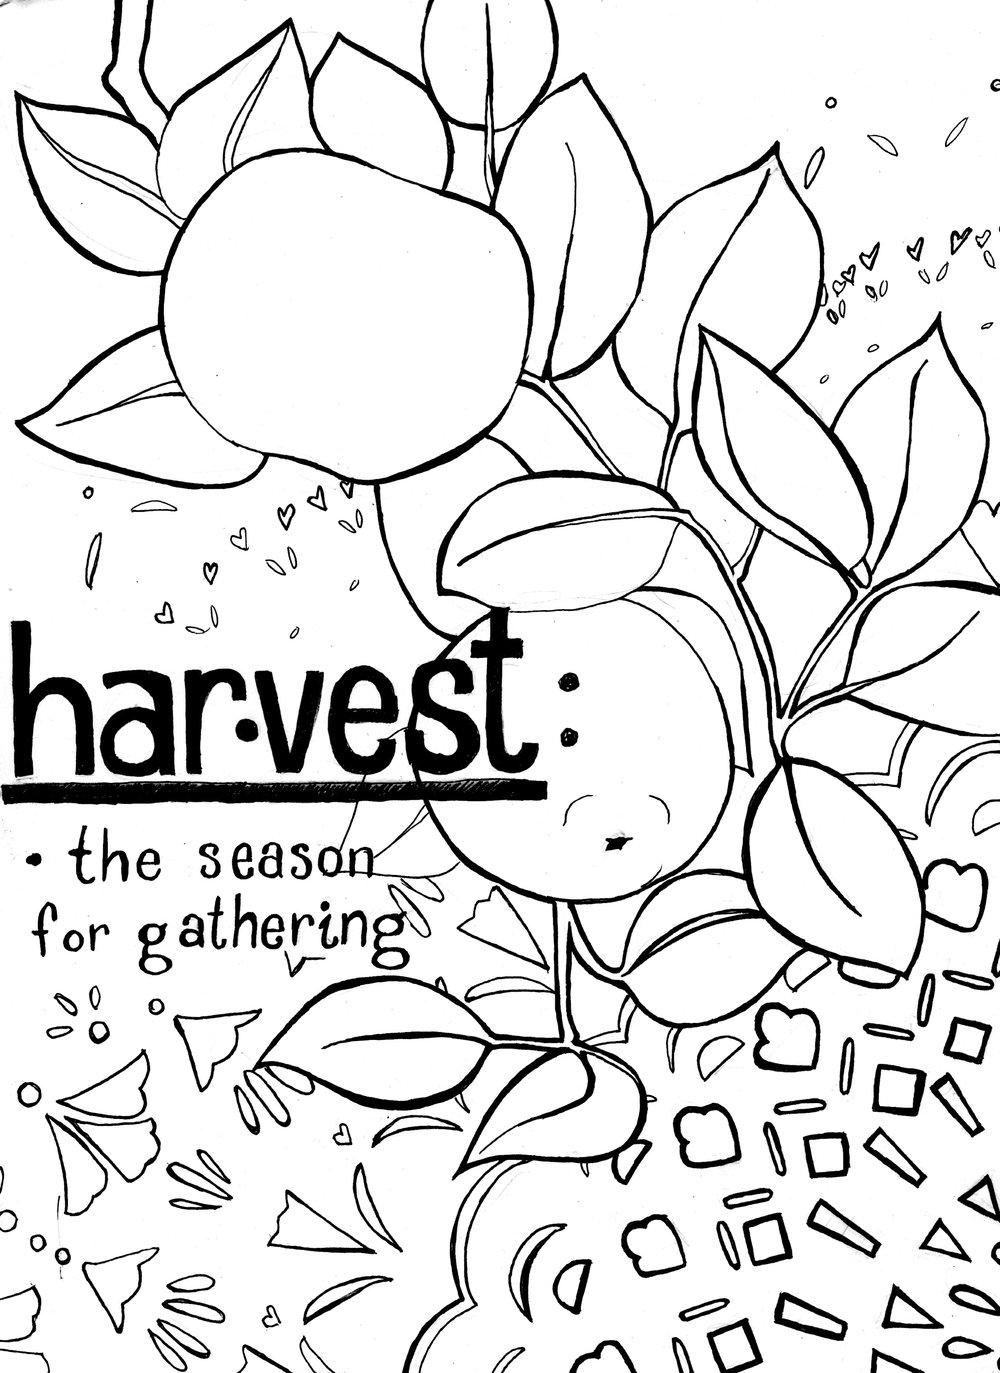 Harvestcoloringpage.jpg